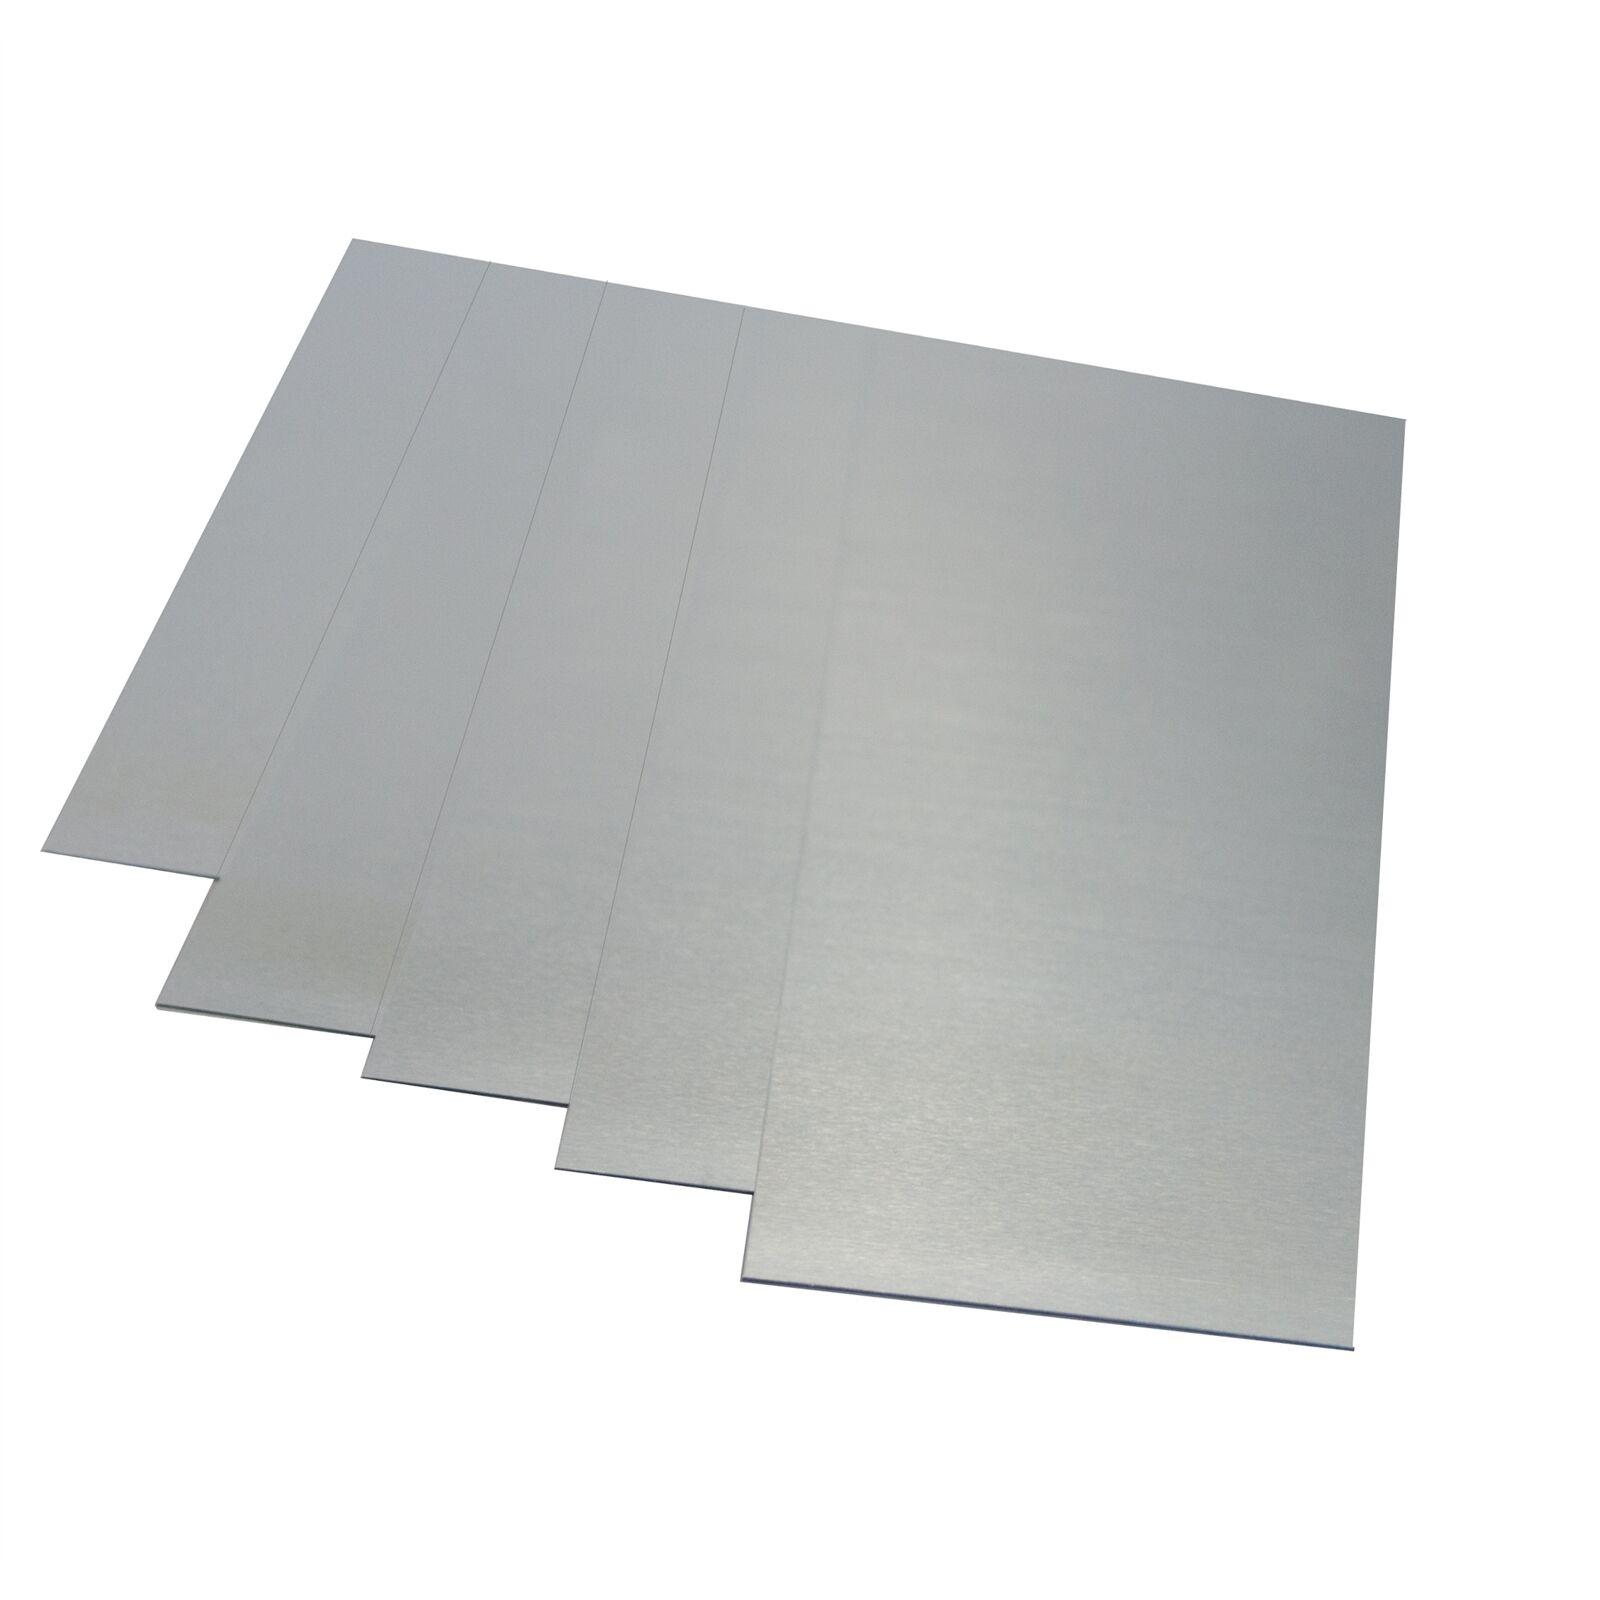 18,50 €//m² 0,75 mm Sheet Steel Iron Plate Sheet Metal dc01 to 1000x1000 MM